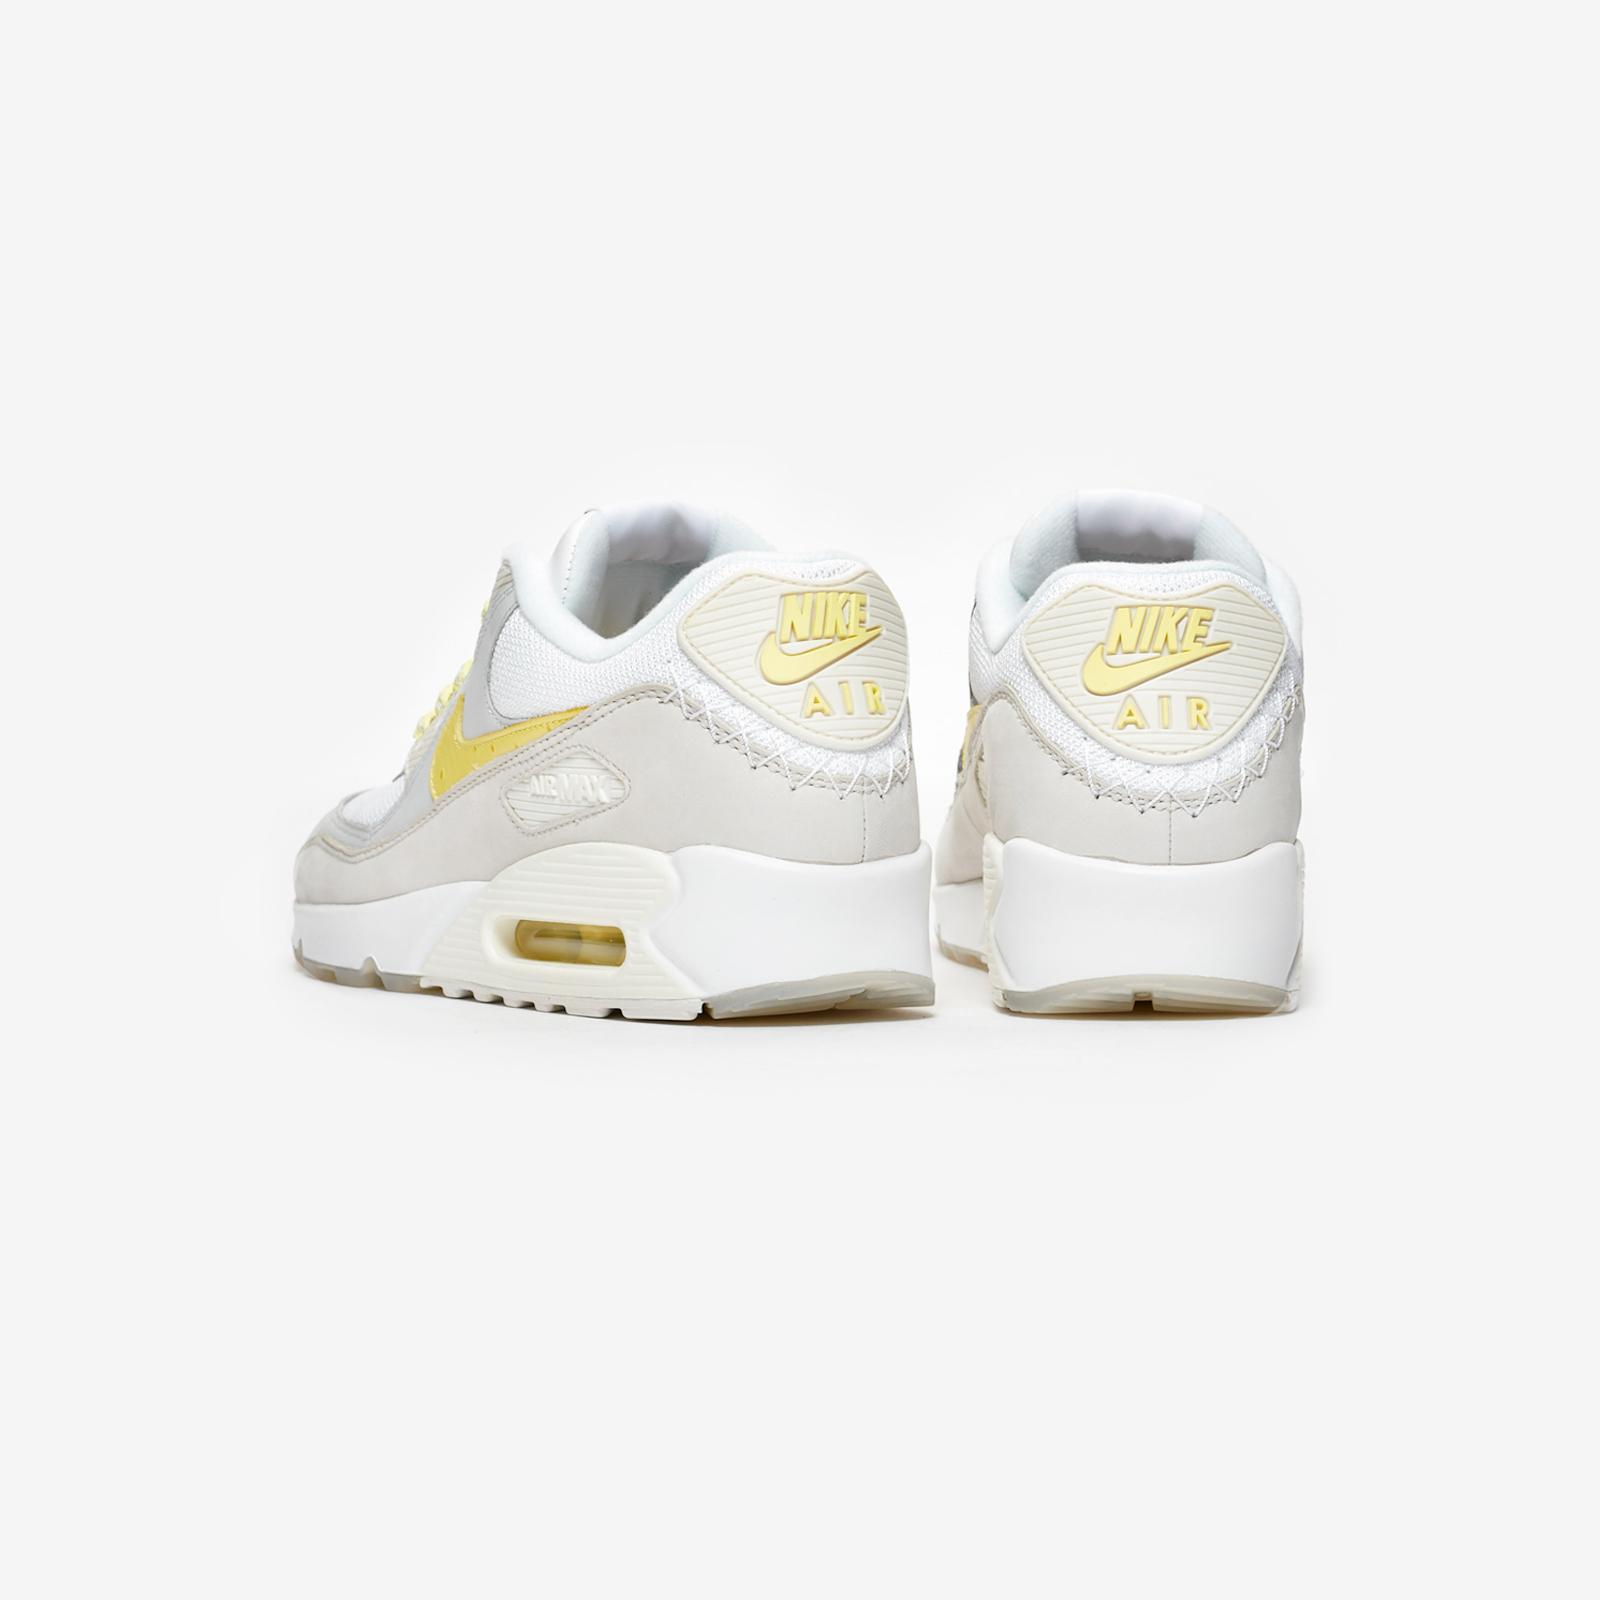 "sale retailer 759eb 6c257 Nike Air Max 90 Premium ""Side A"" - Ci6394-100 - Sneakersnstuff   sneakers    streetwear online since 1999"